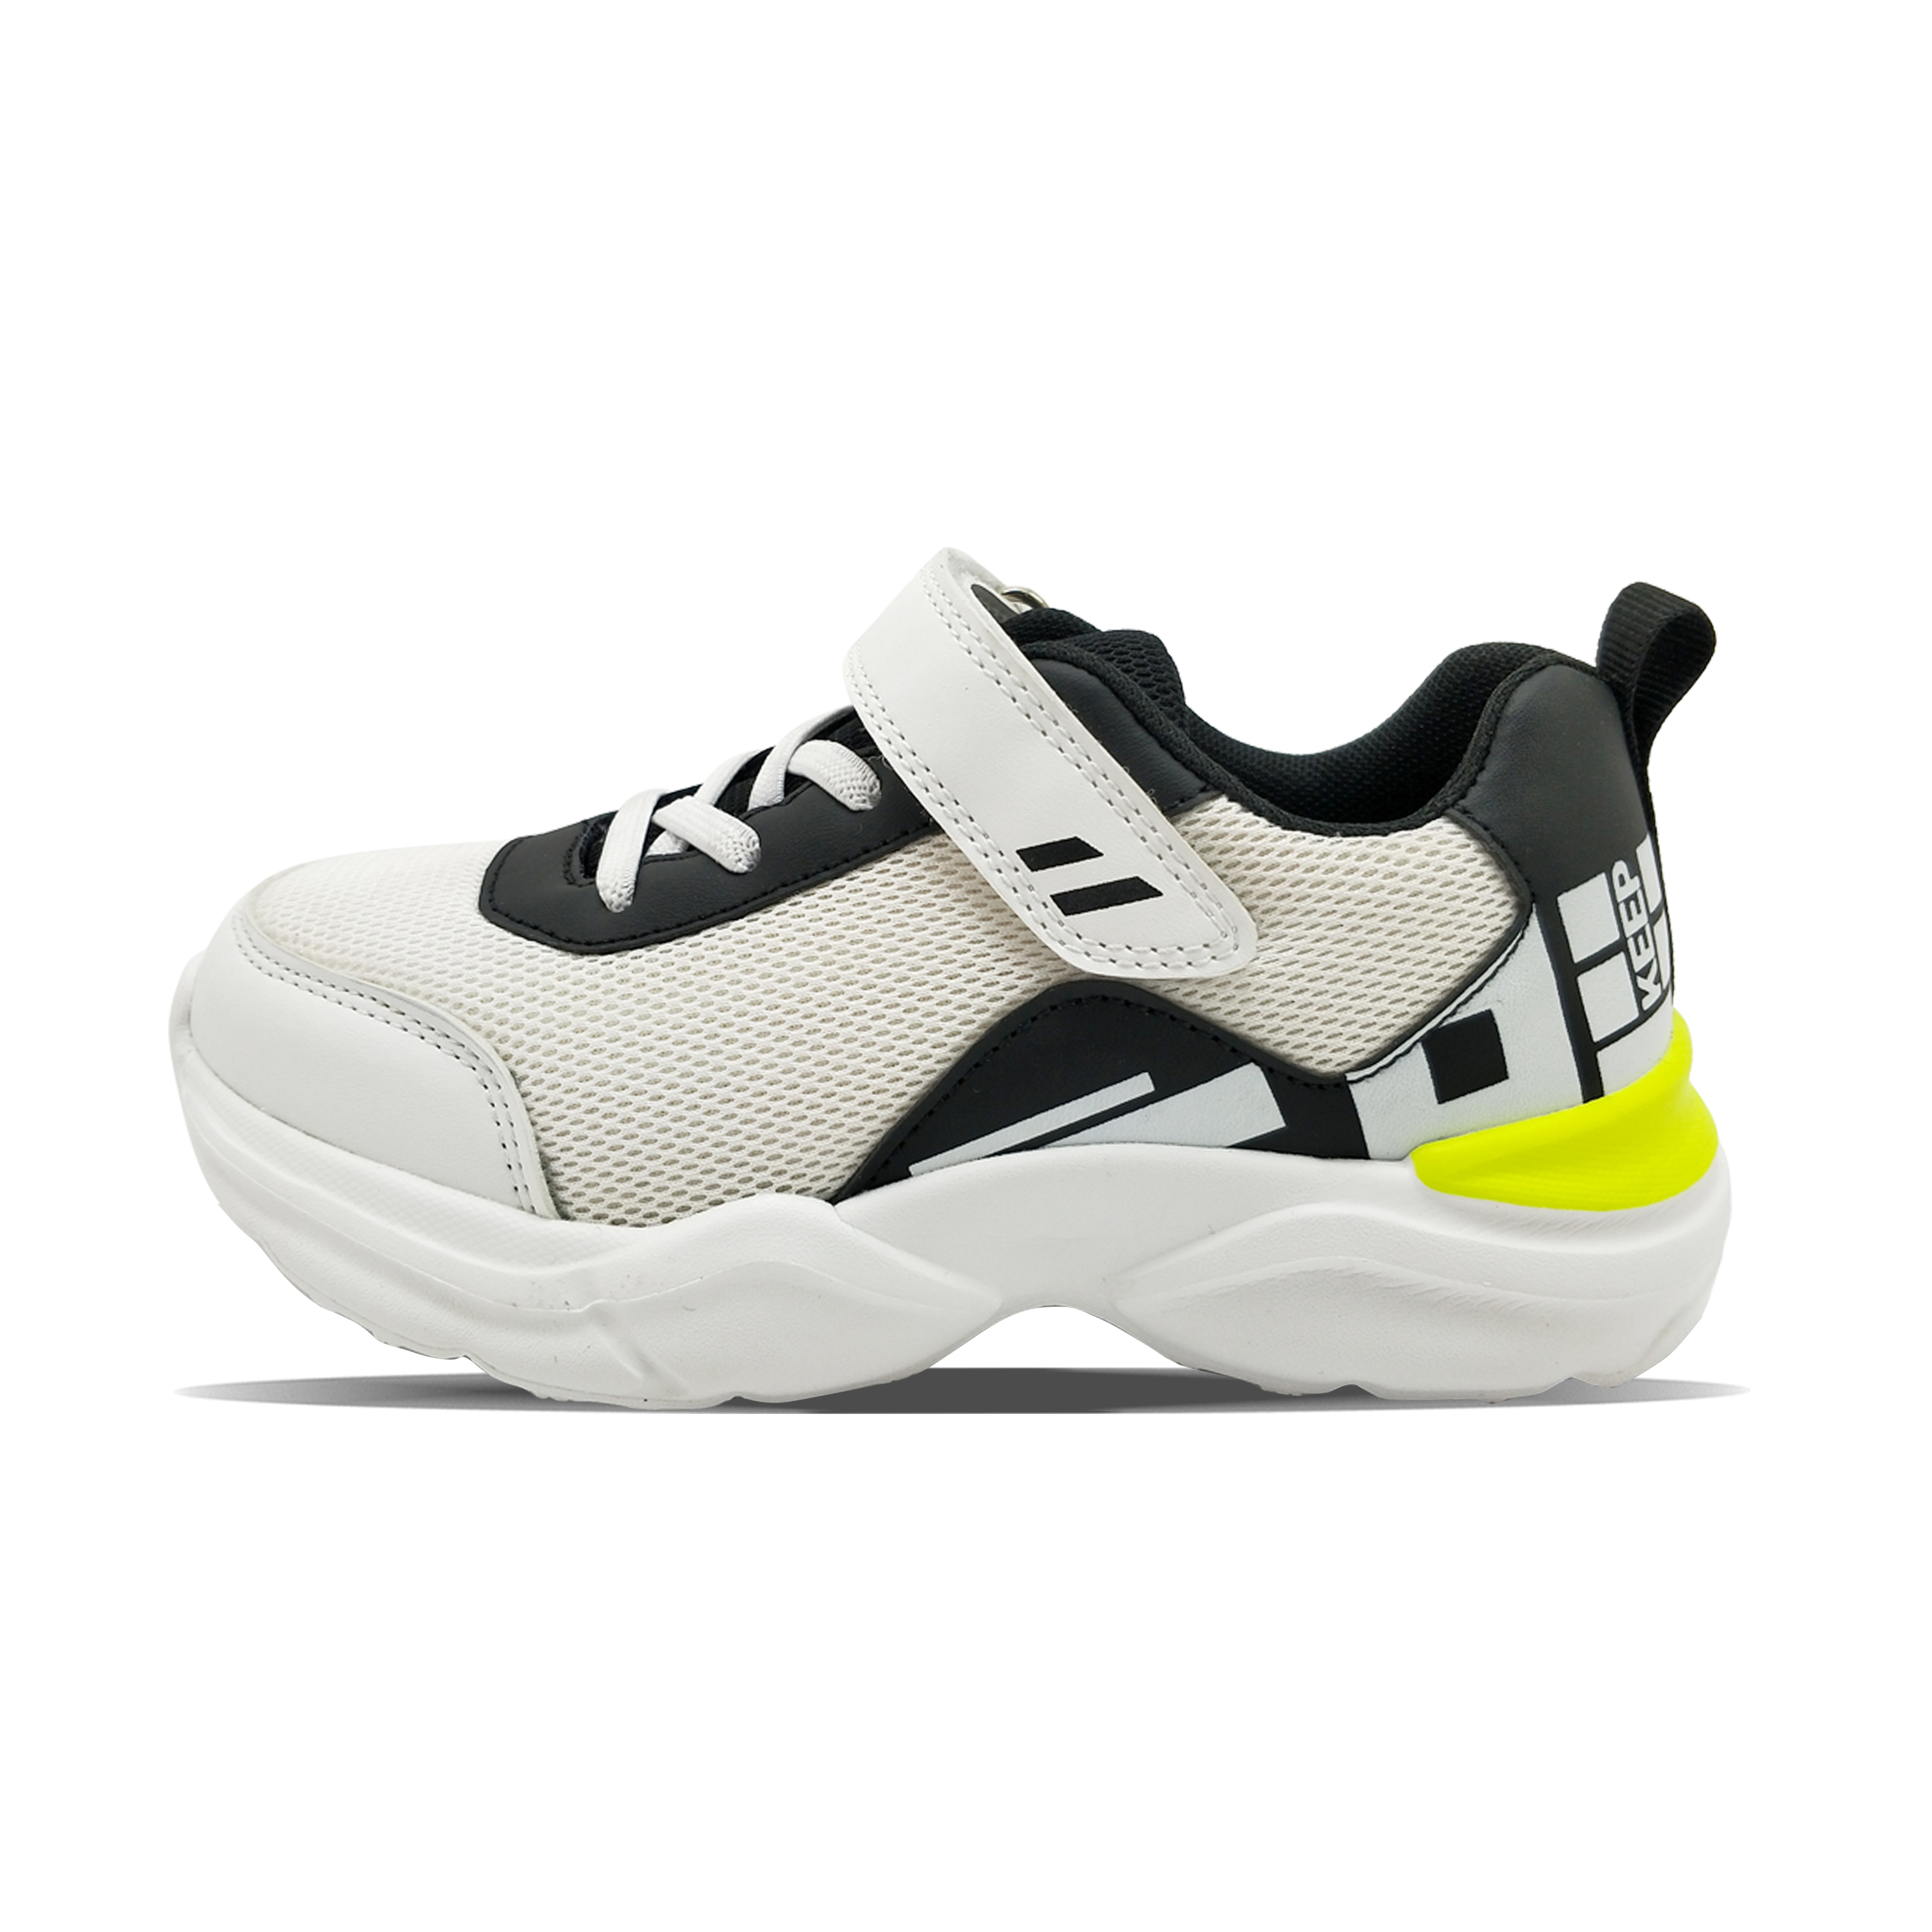 mesh PU graffiti style boy's casual shoes